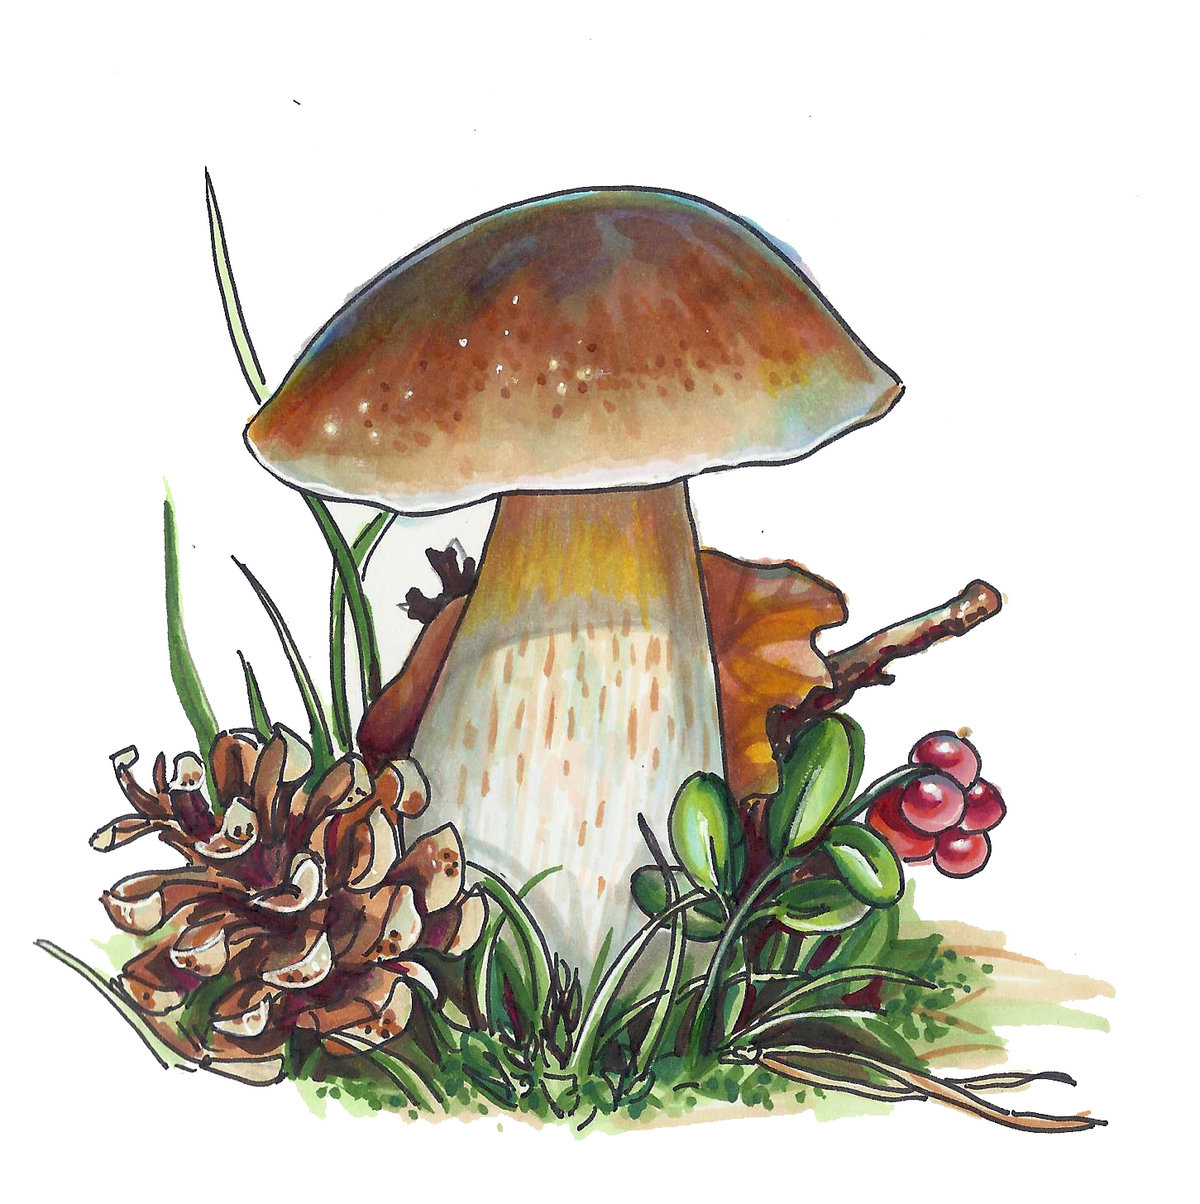 серединки белый гриб рисунок картинка большой